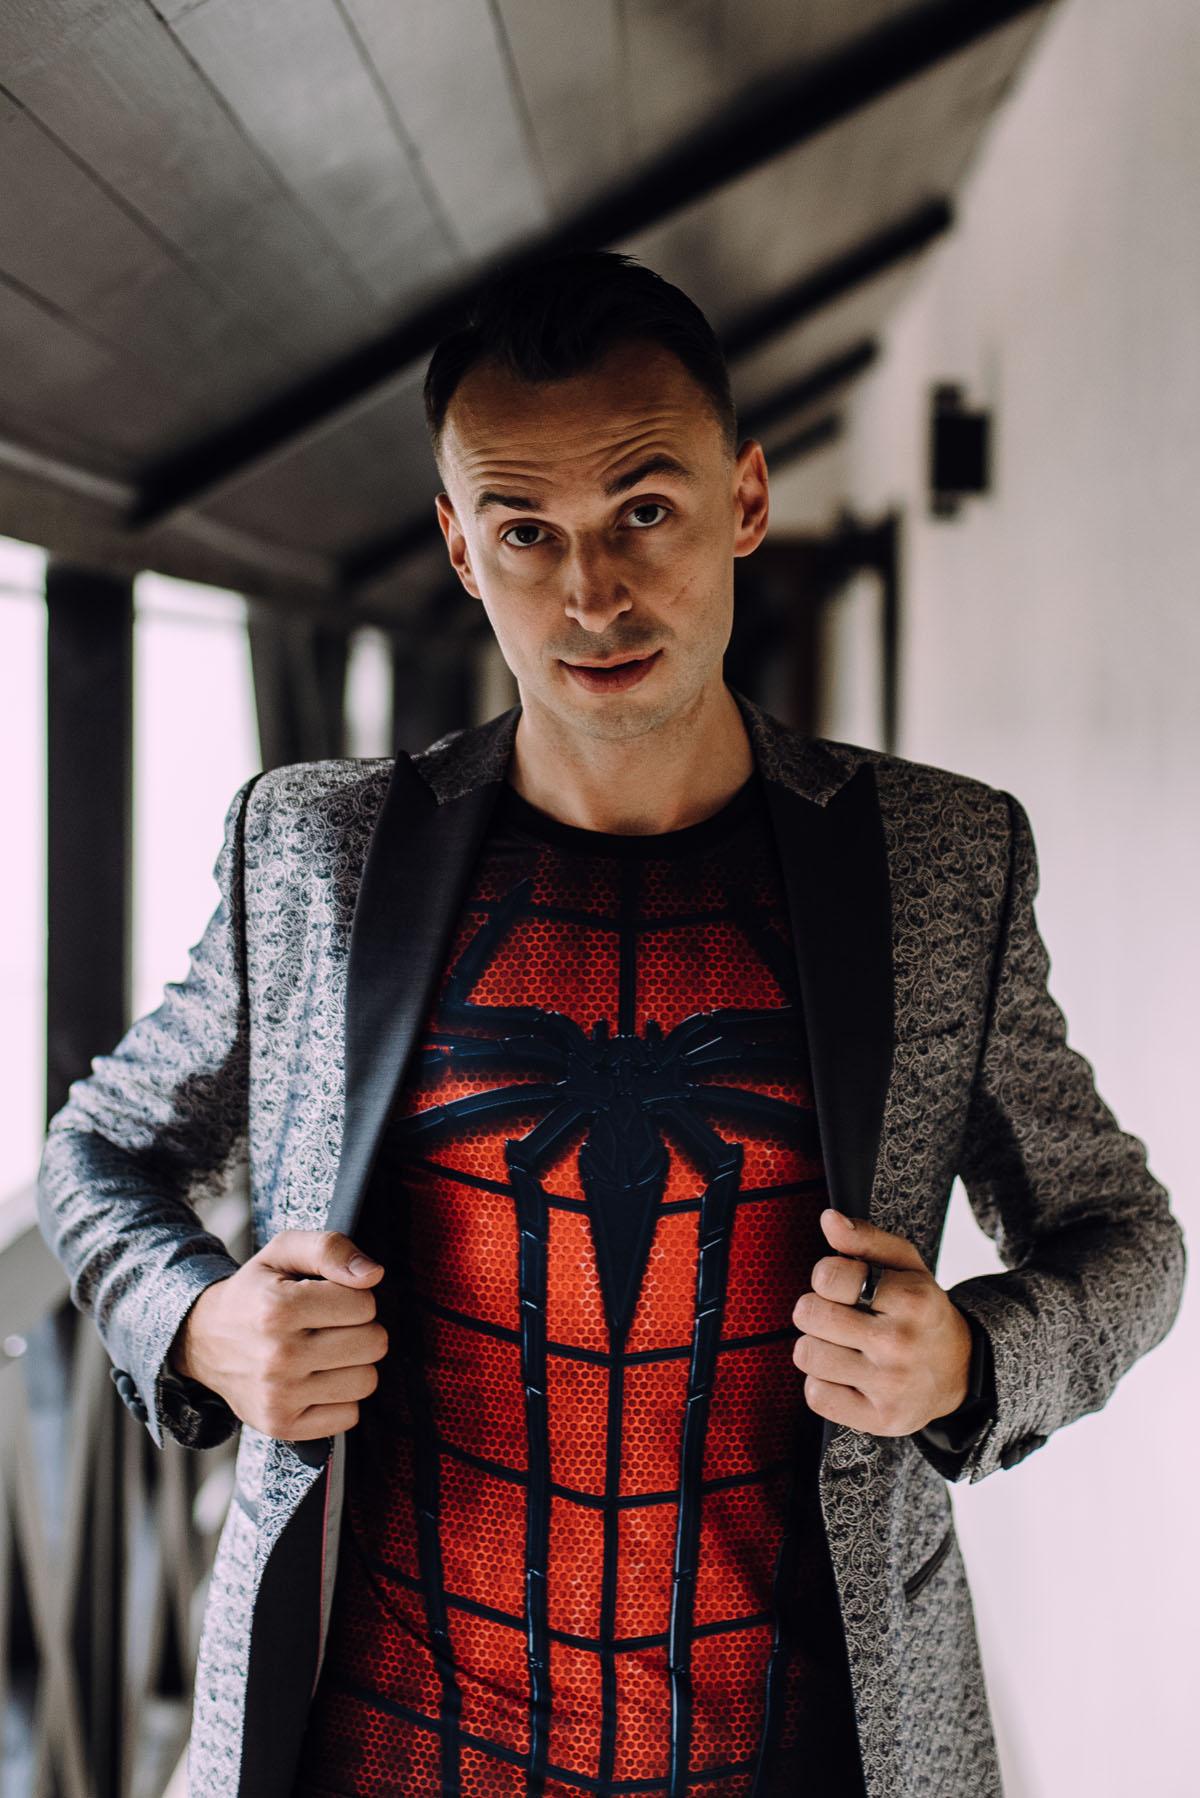 slub-wesele-z-elementami-komiksowych-superbohaterow-uniwersum-Marvela-DC-Comics-Iza-Szymon-034